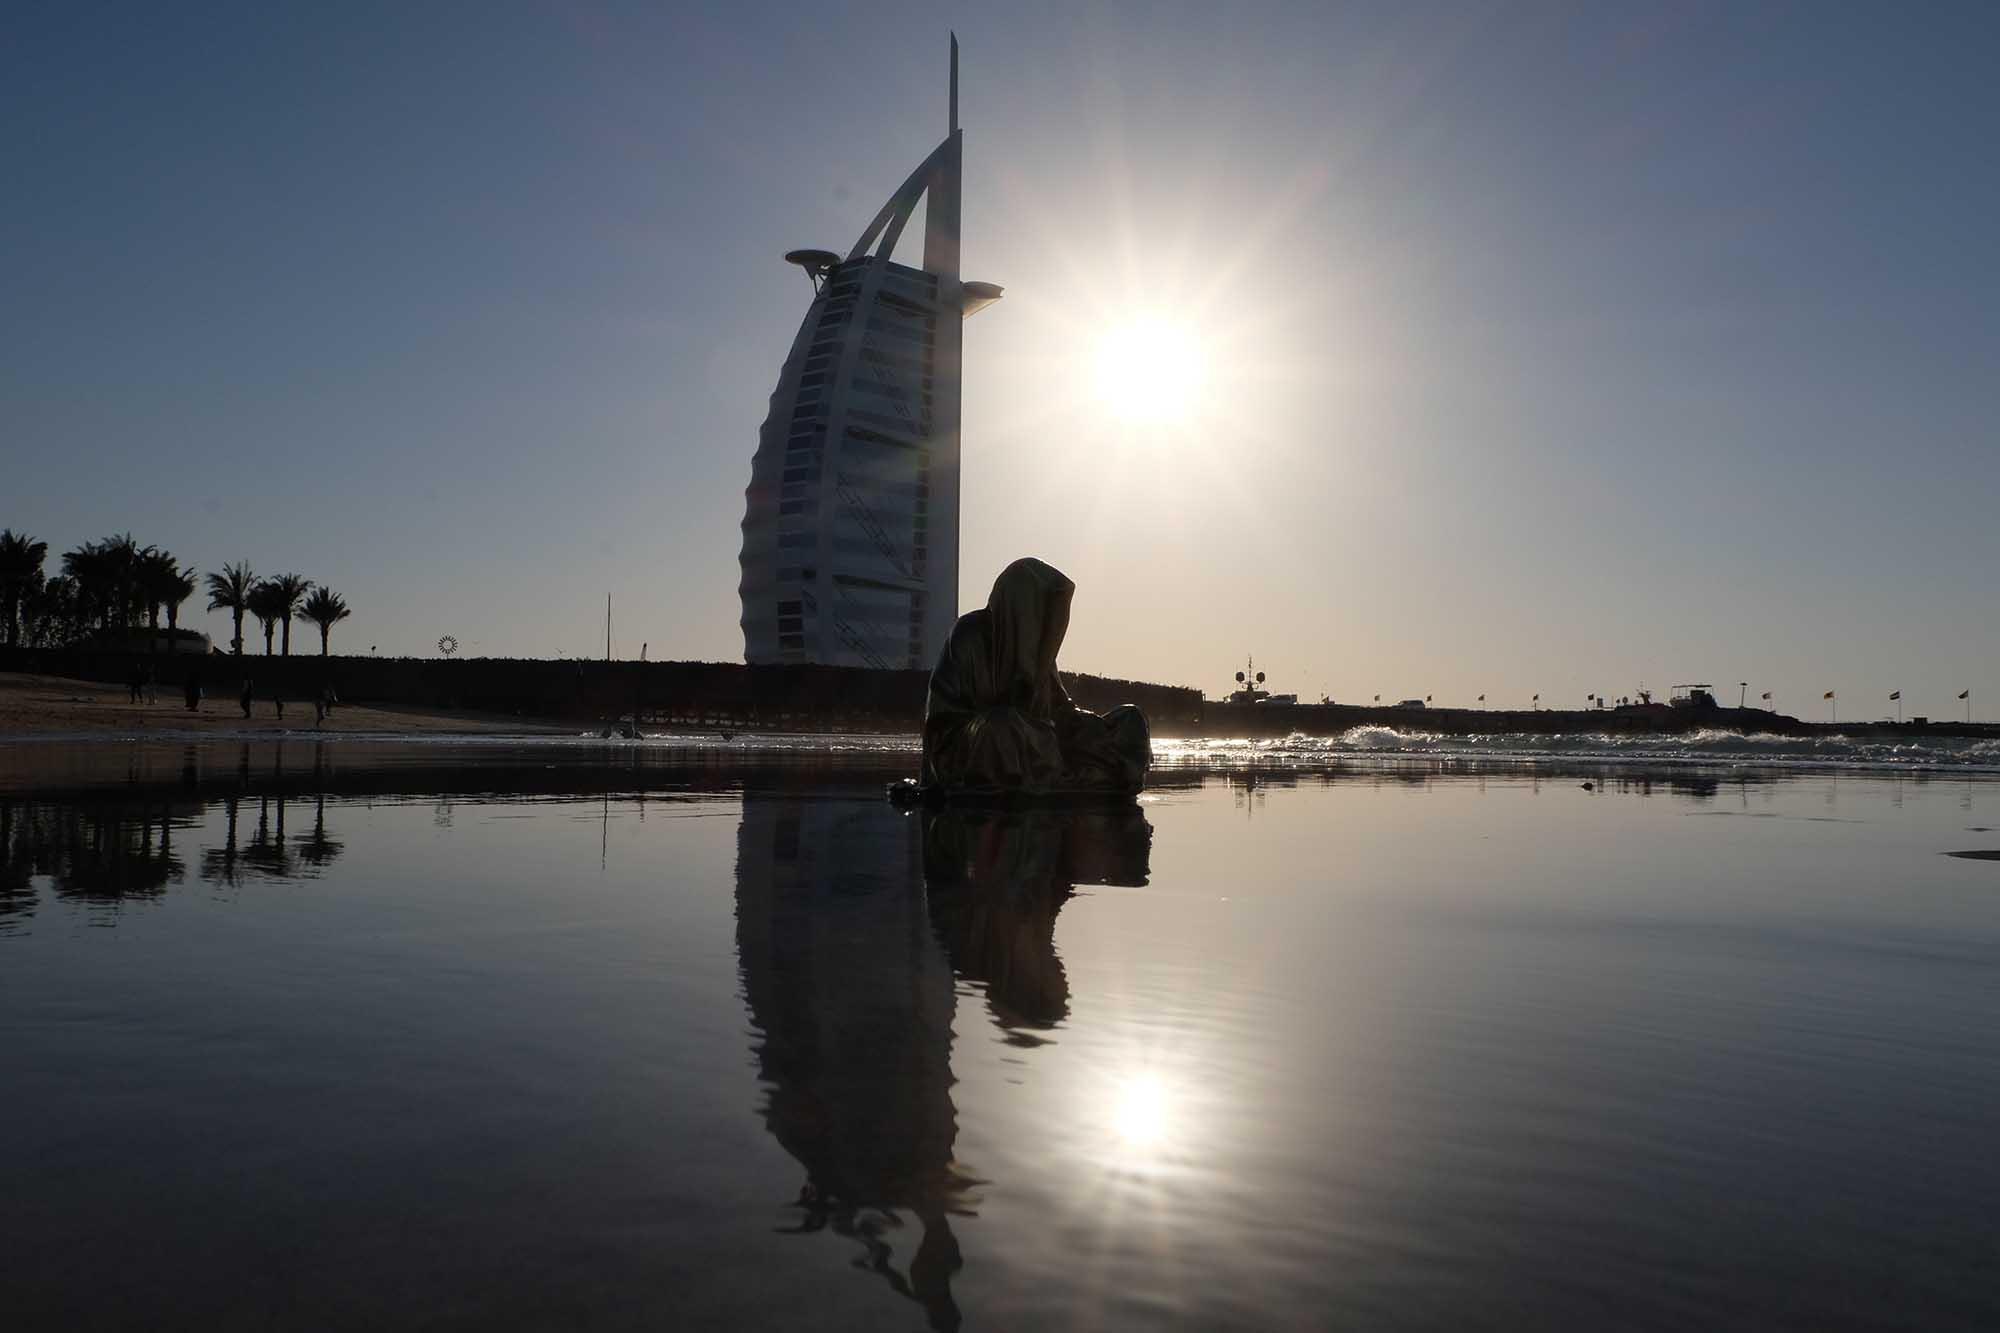 dubai emirates guardians of time manfred kili kielnhofer contemporary art modern design fine arts faceless photography antique statue 9390